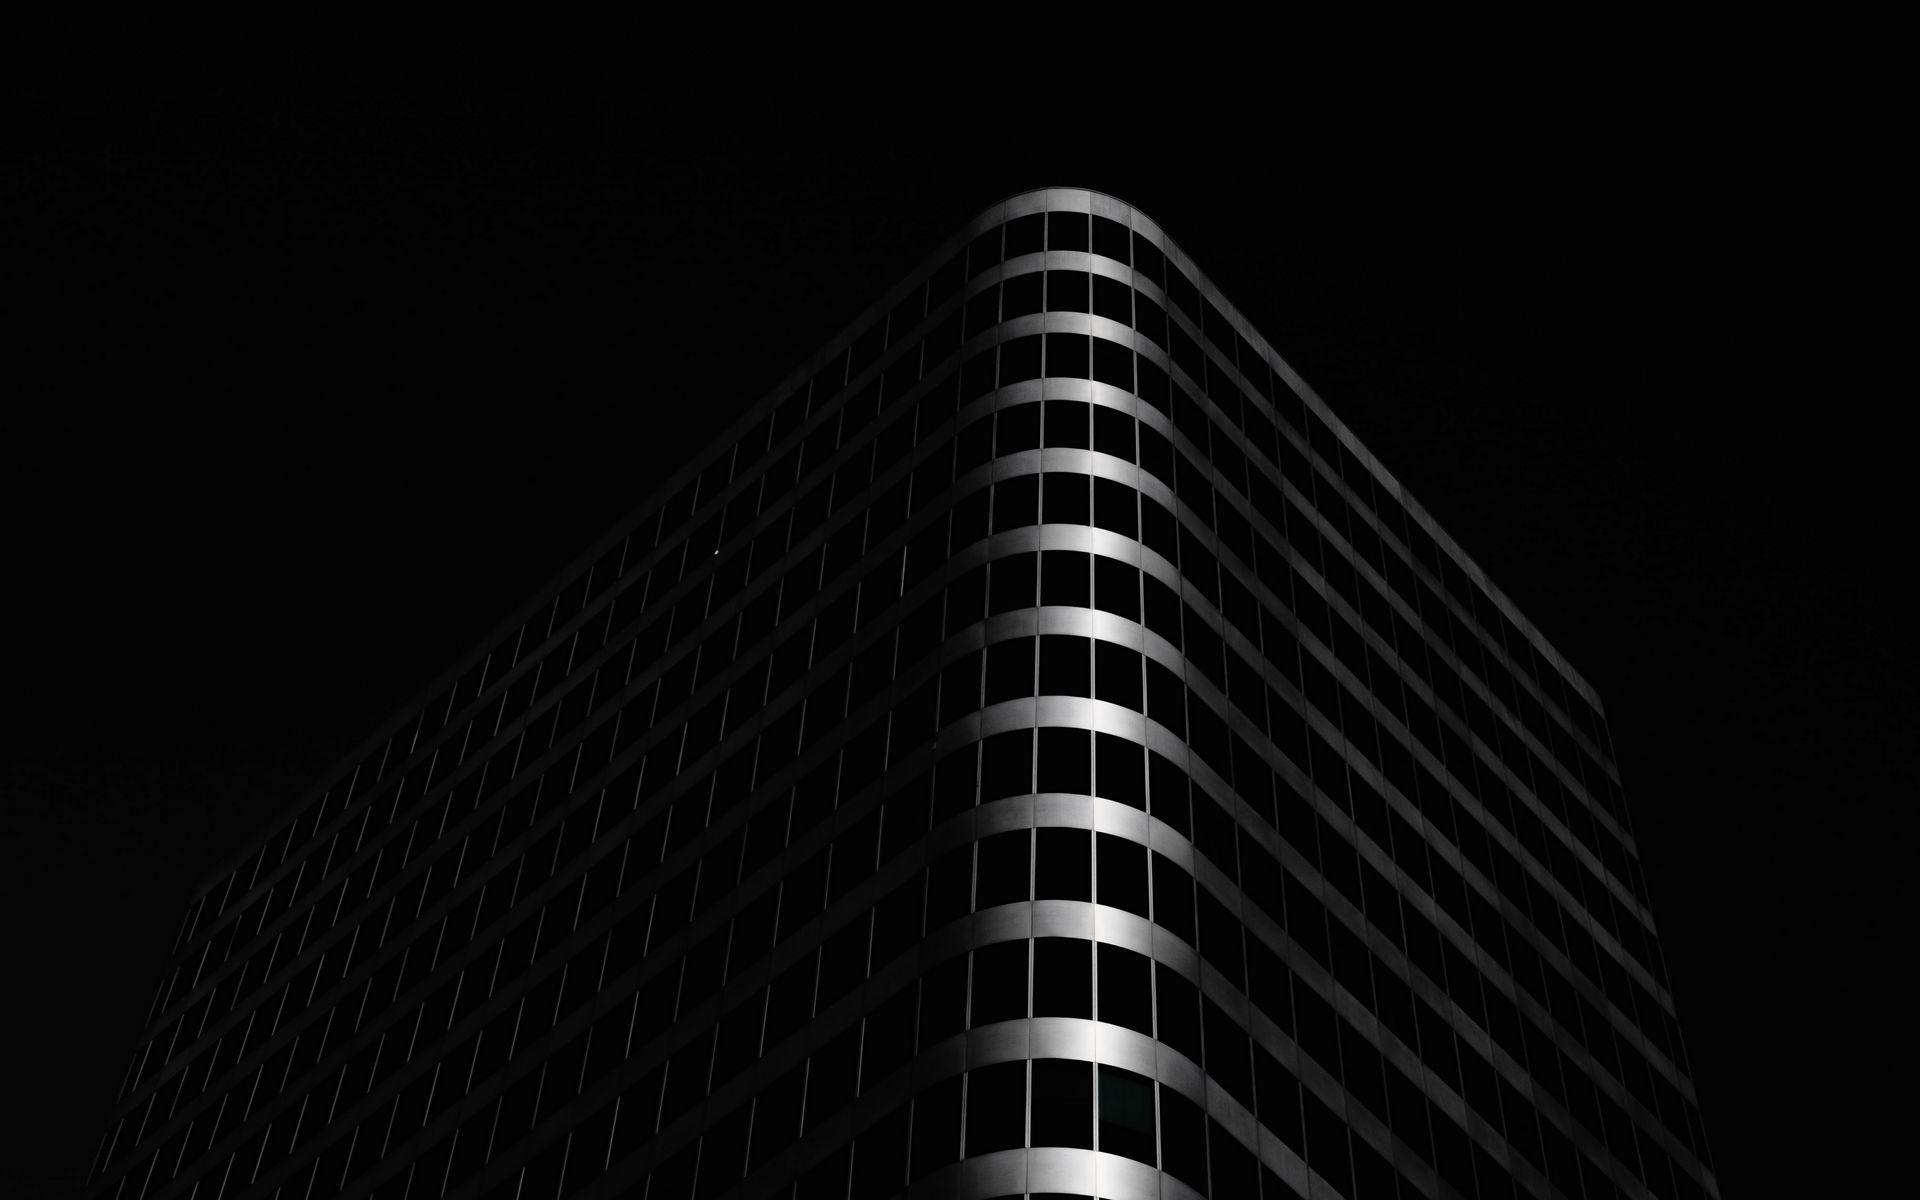 1920x1200 Wallpaper building, architecture, black, dark